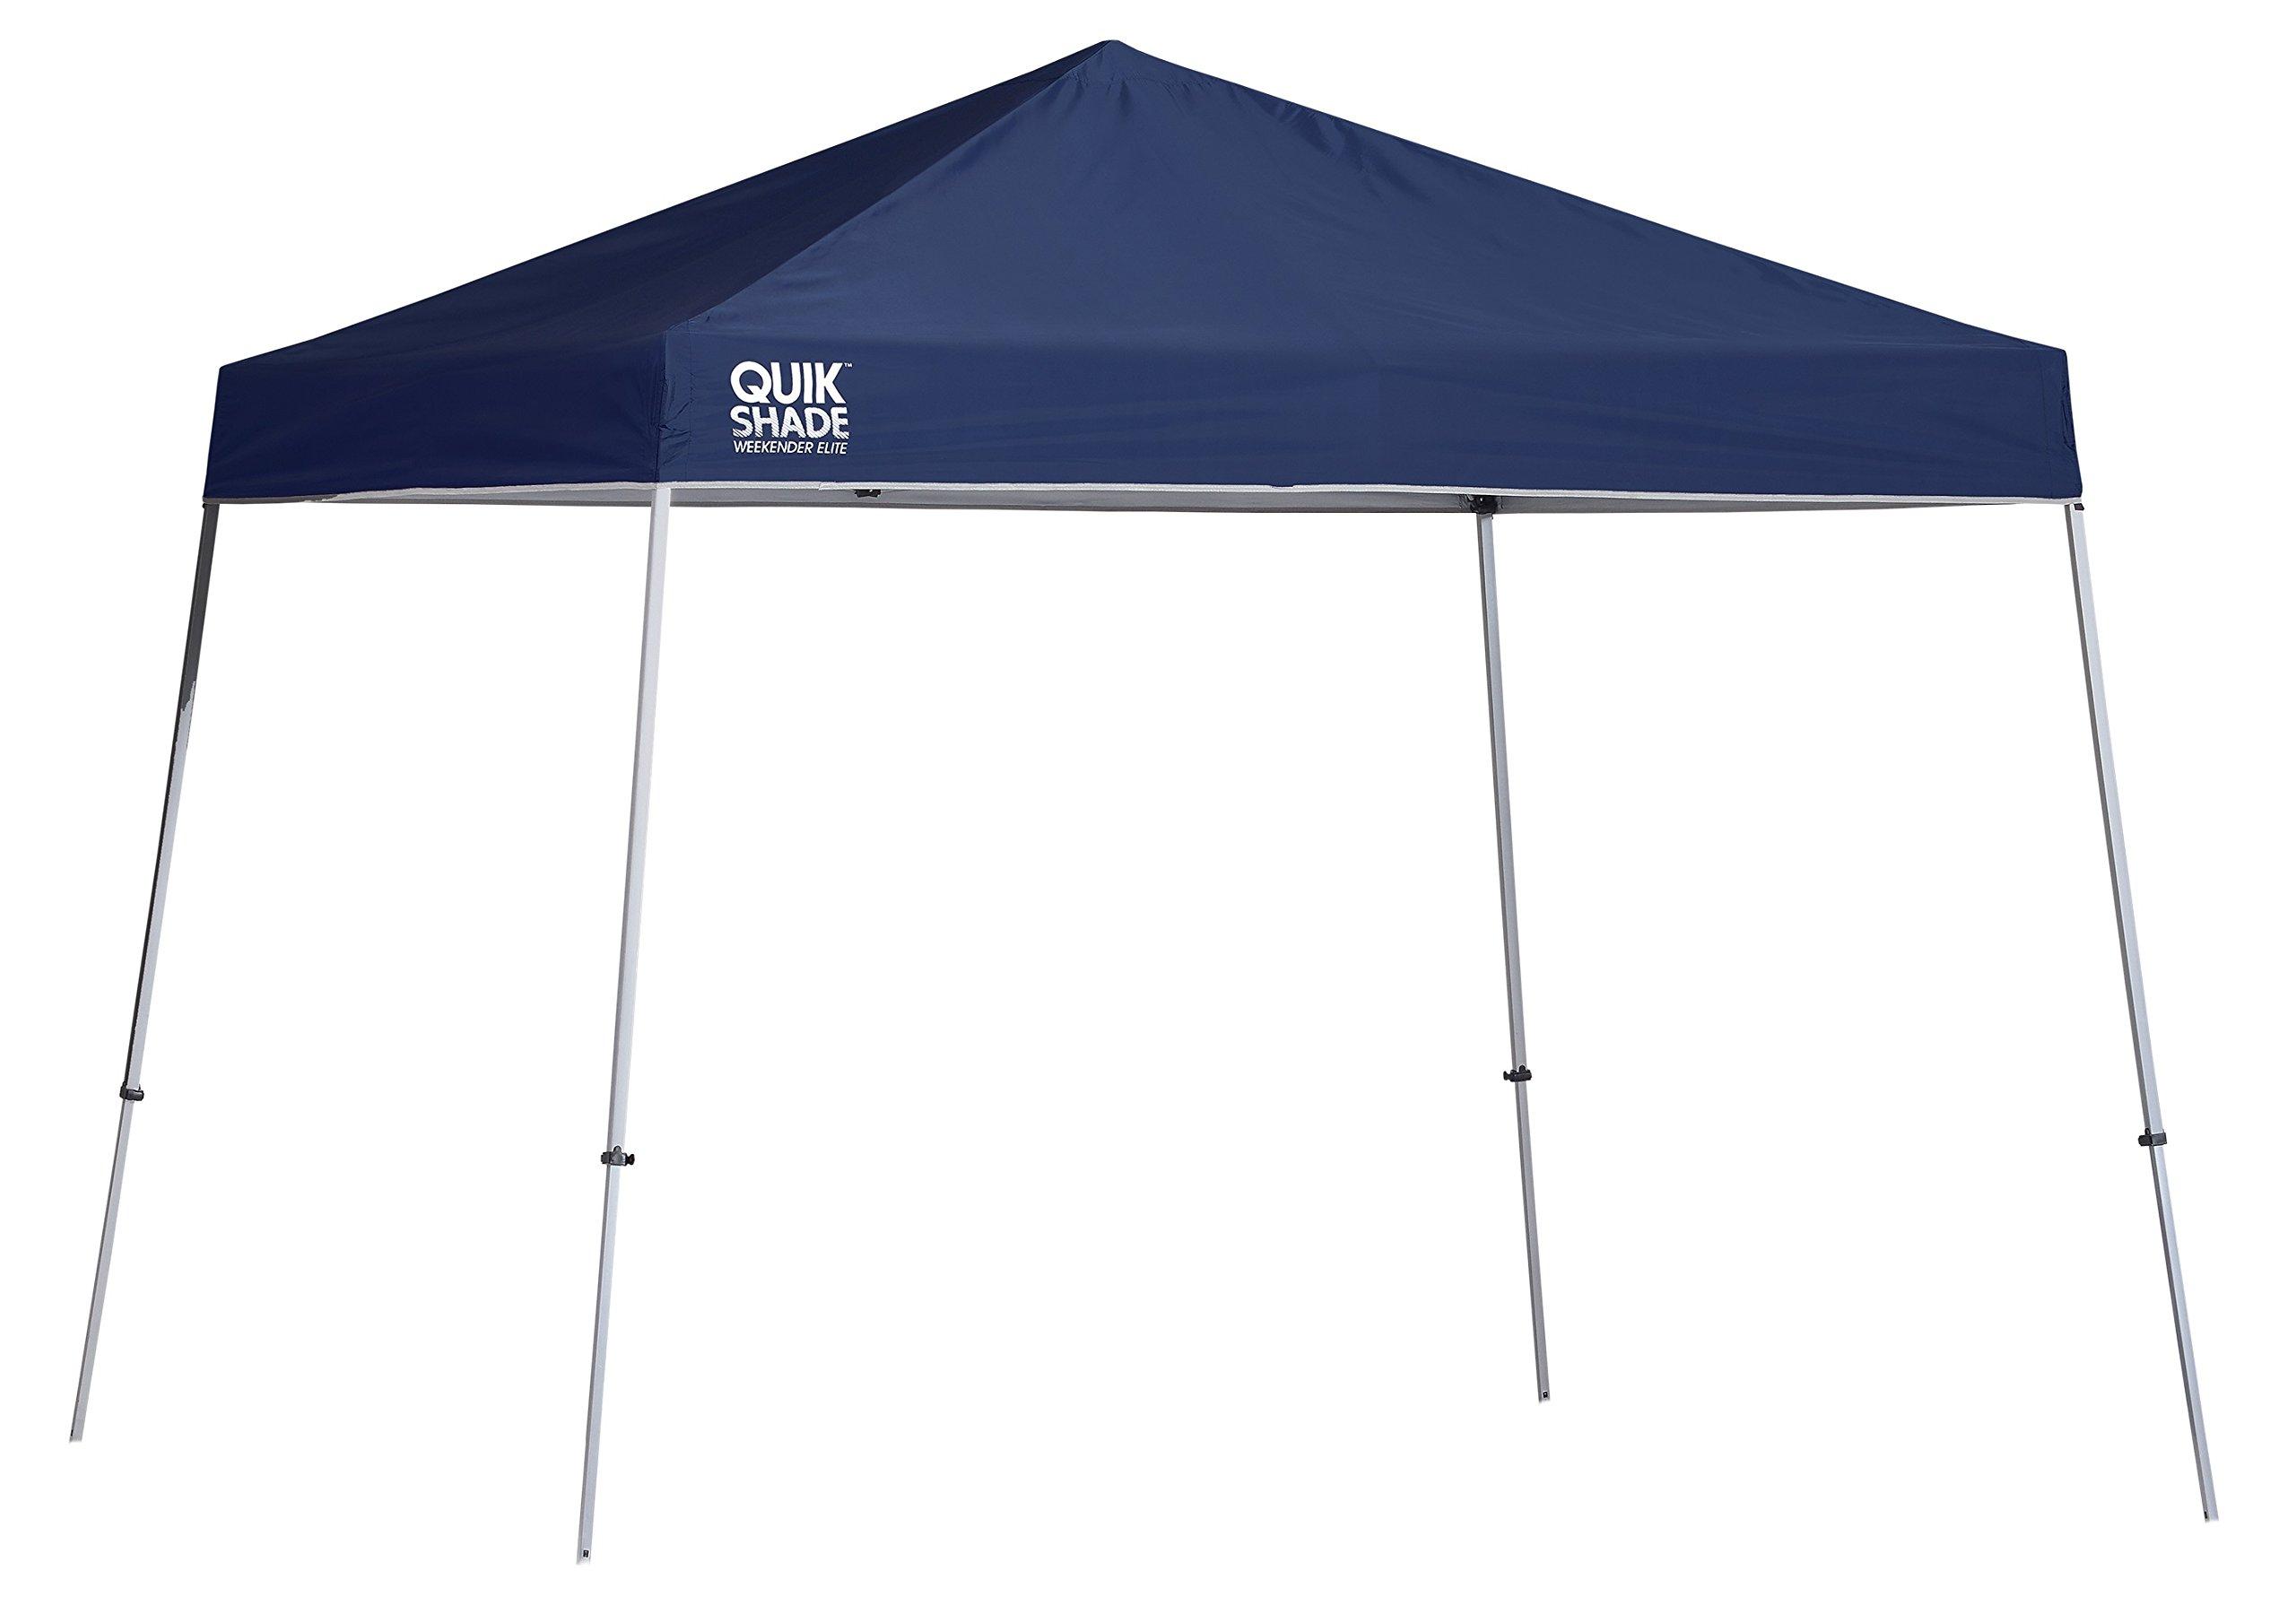 Quik Shade Weekender Elite WE81 12'x12' Instant Canopy - Navy Blue